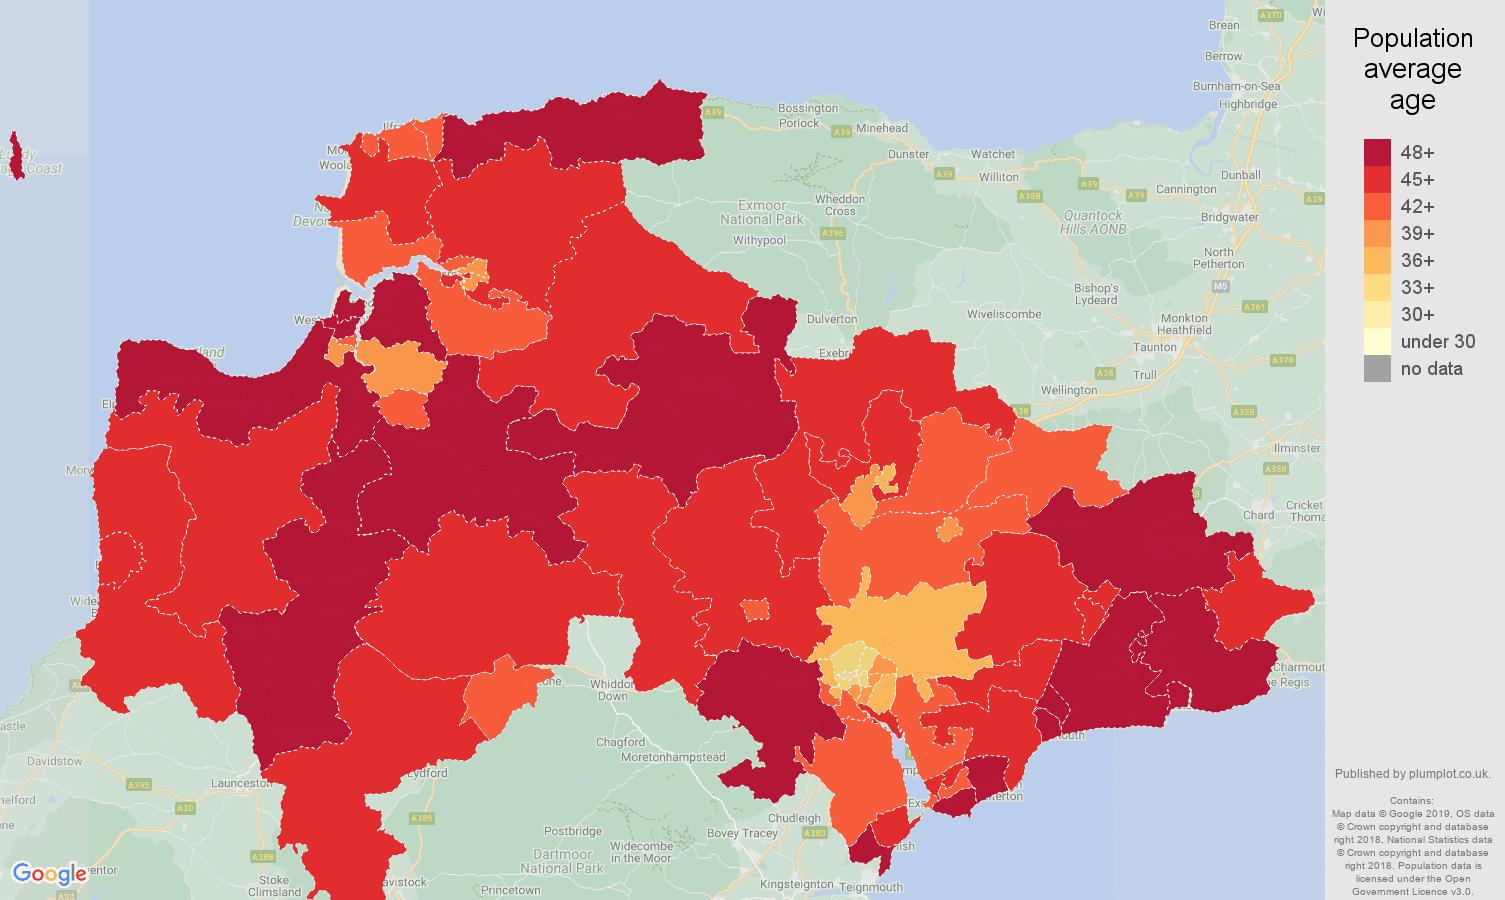 Exeter population average age map